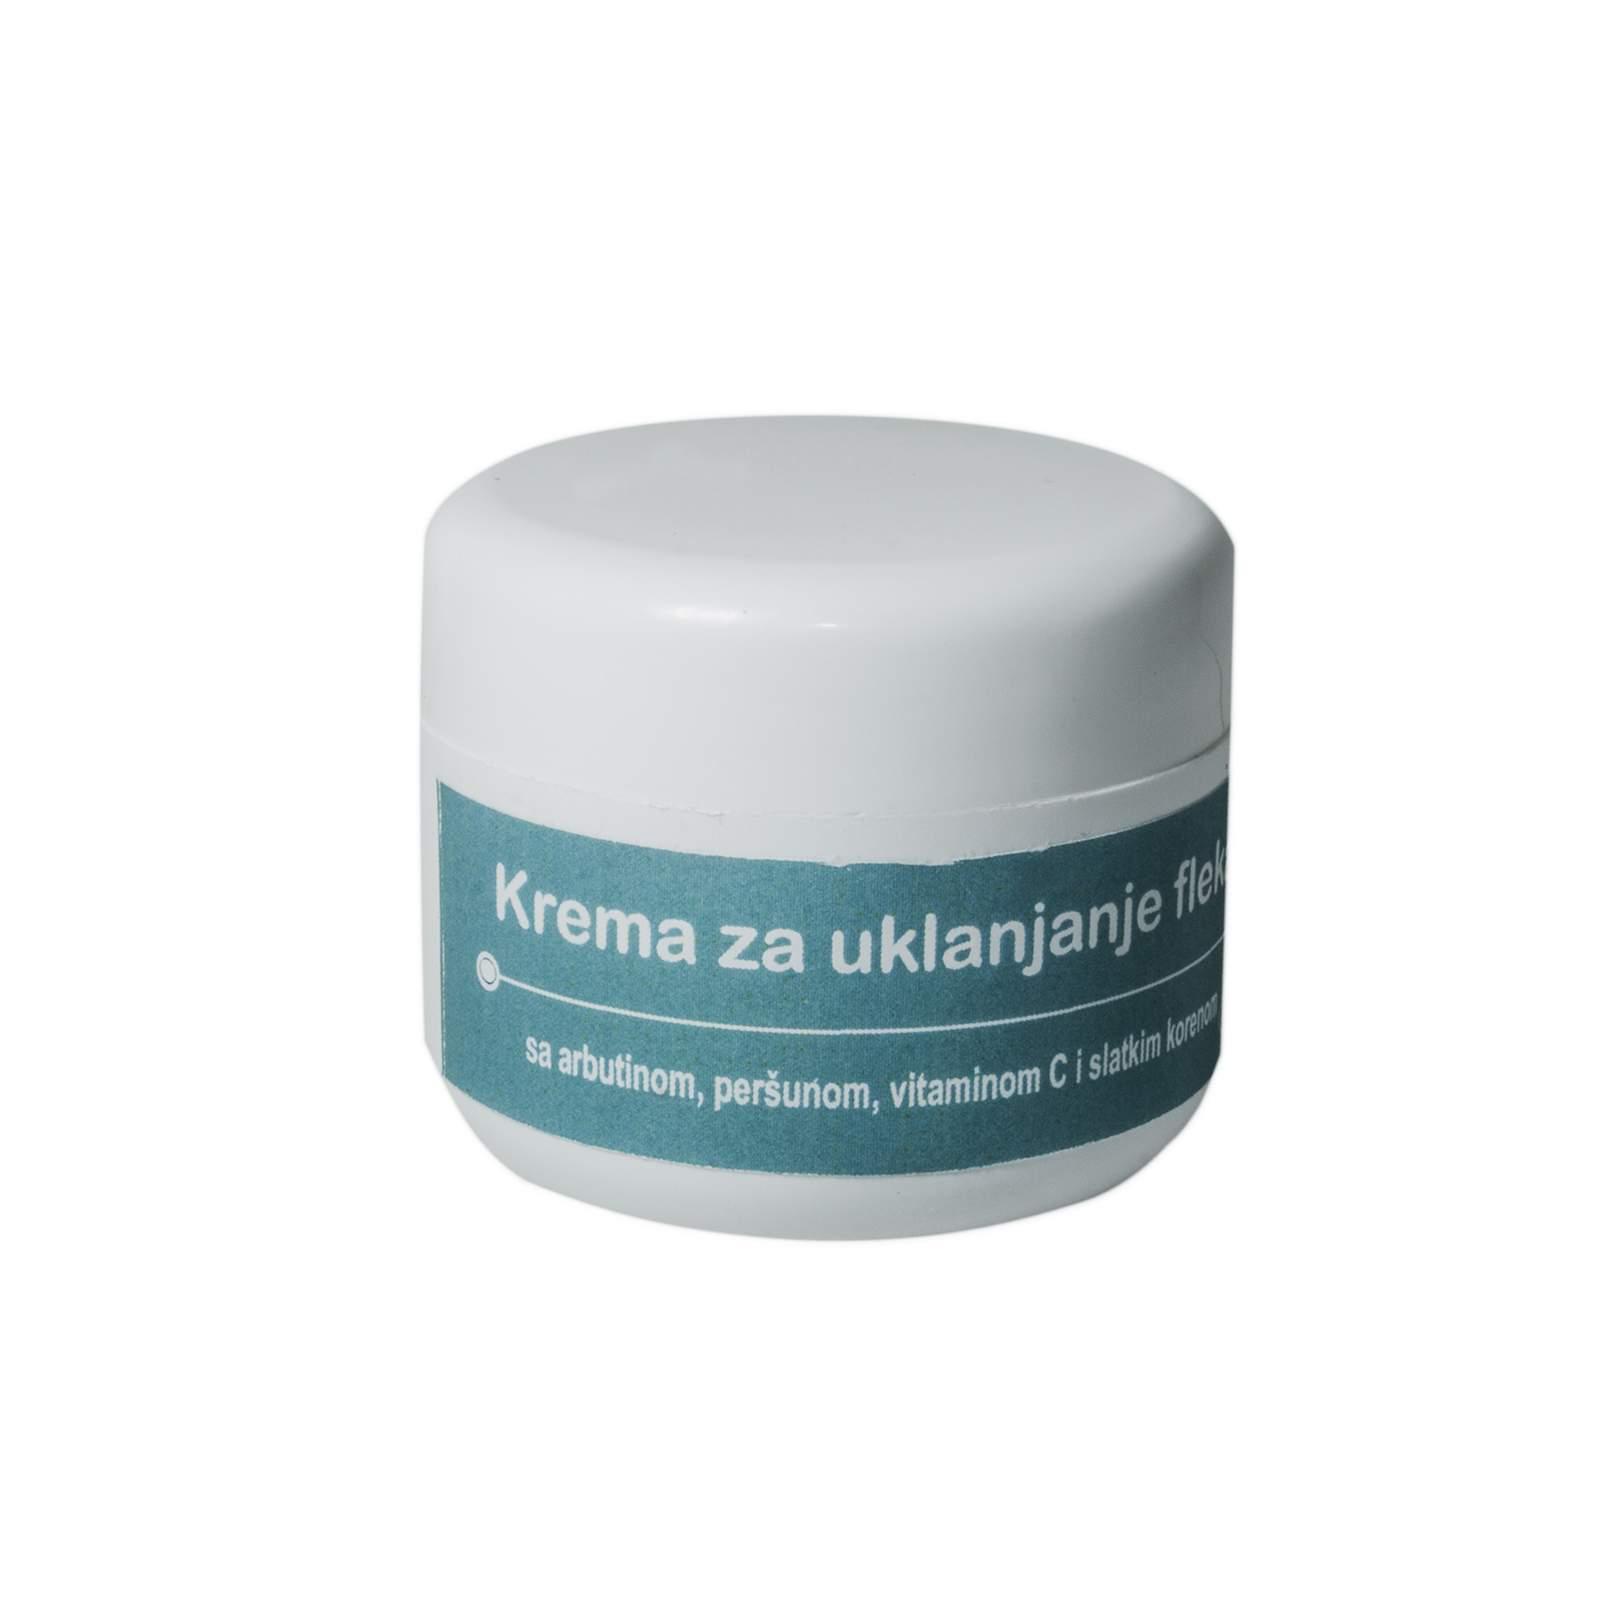 Skin Lightening Cream with Alpha Arbutin, Licorice and Parsley hydrosol